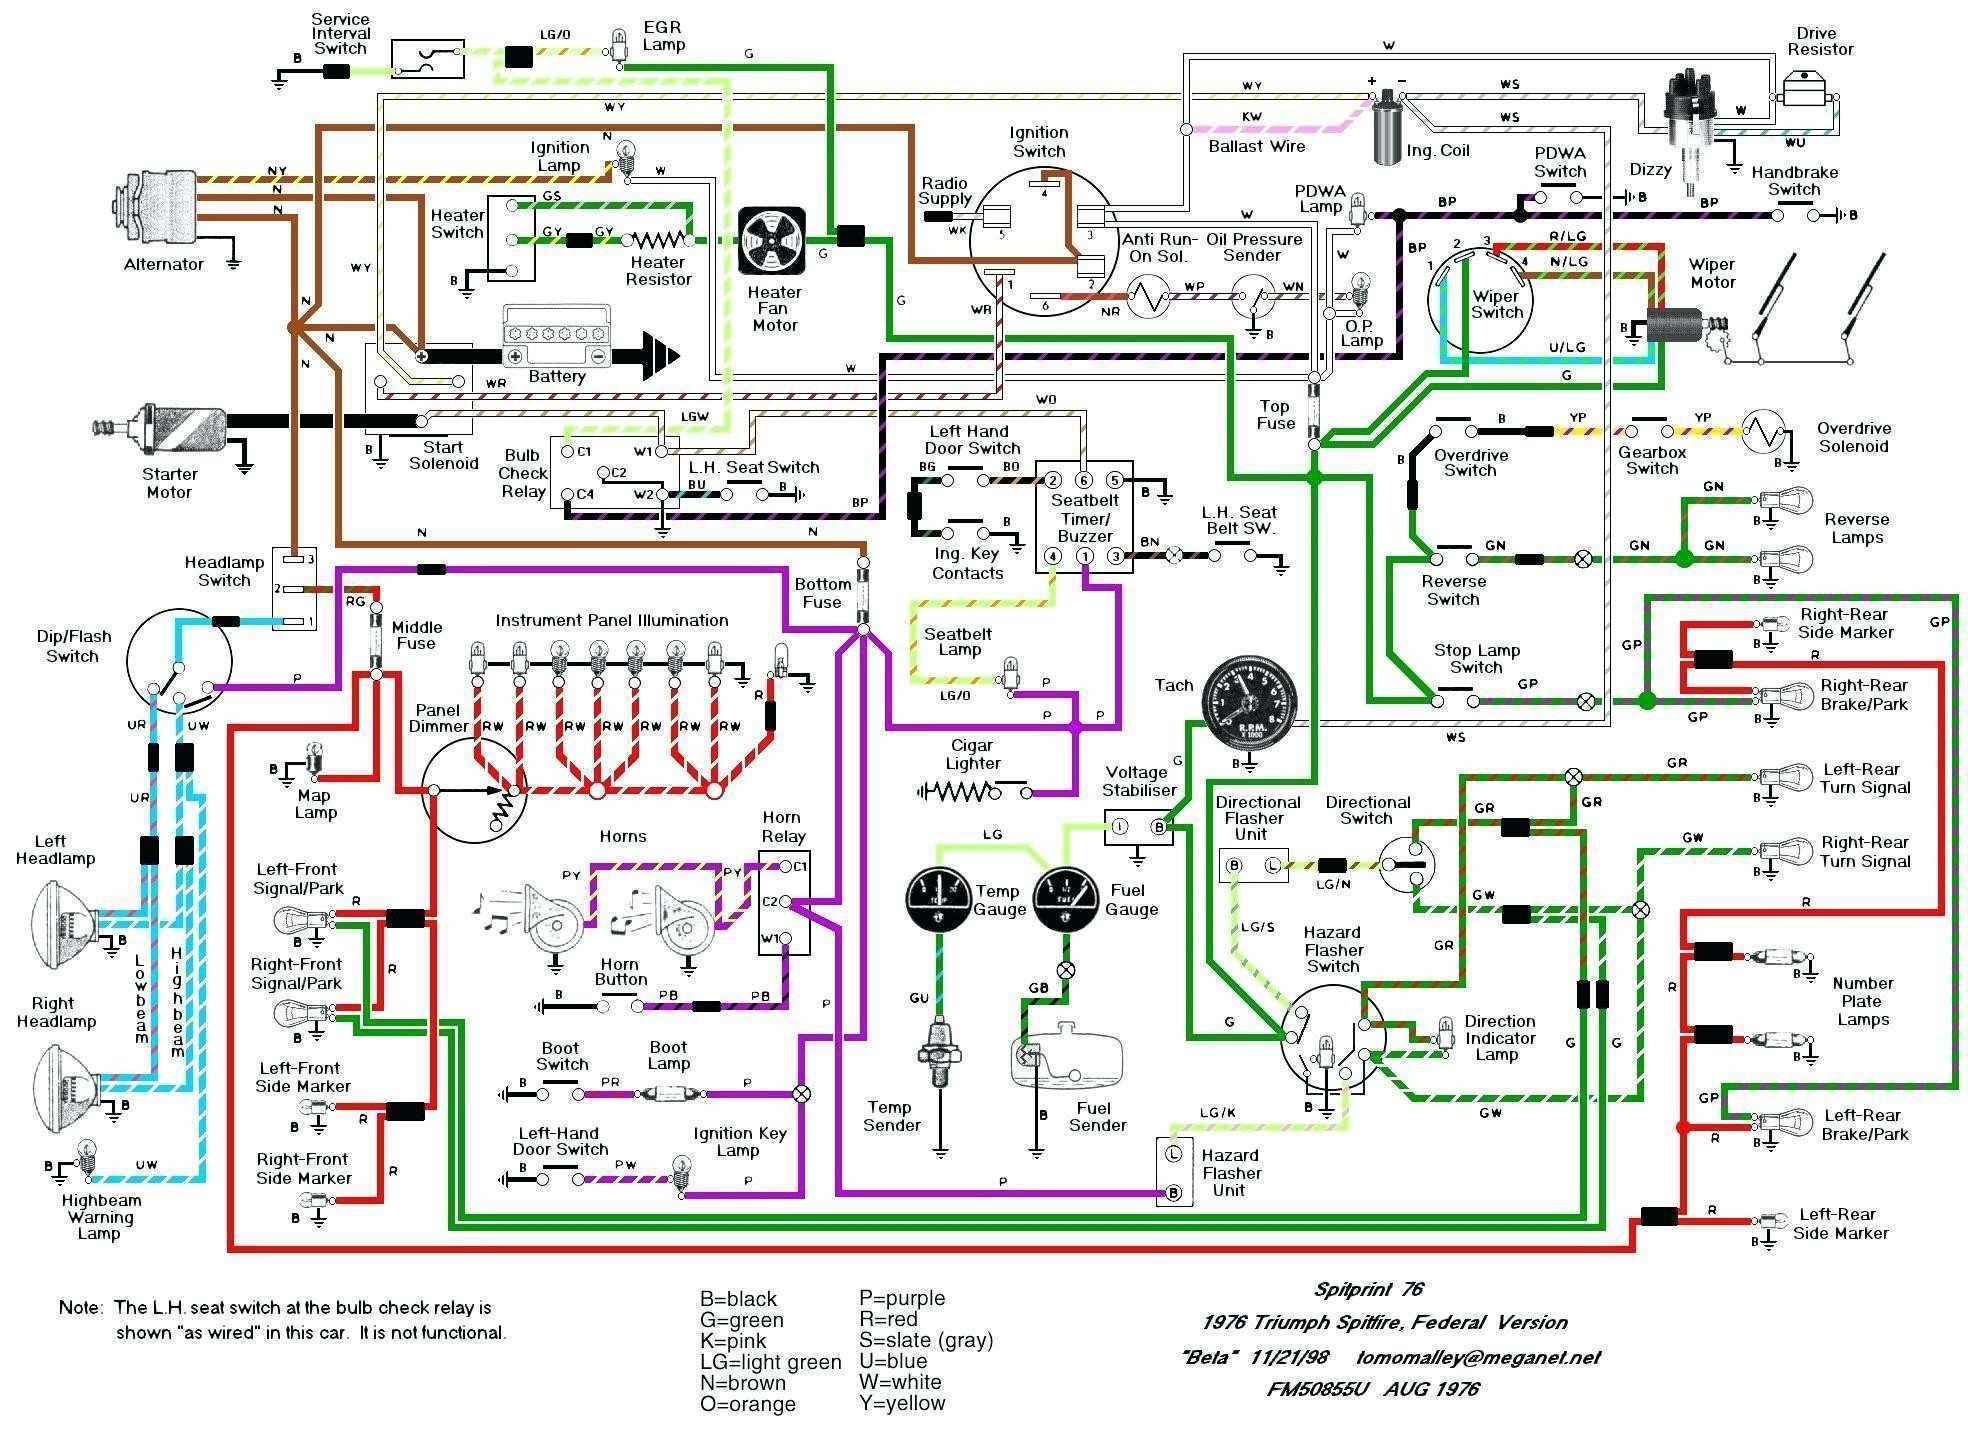 2002 bluebird bus wiring diagram wire diagram 2005 bluebird school bus wiring diagram e7  wire diagram 2005 bluebird school bus